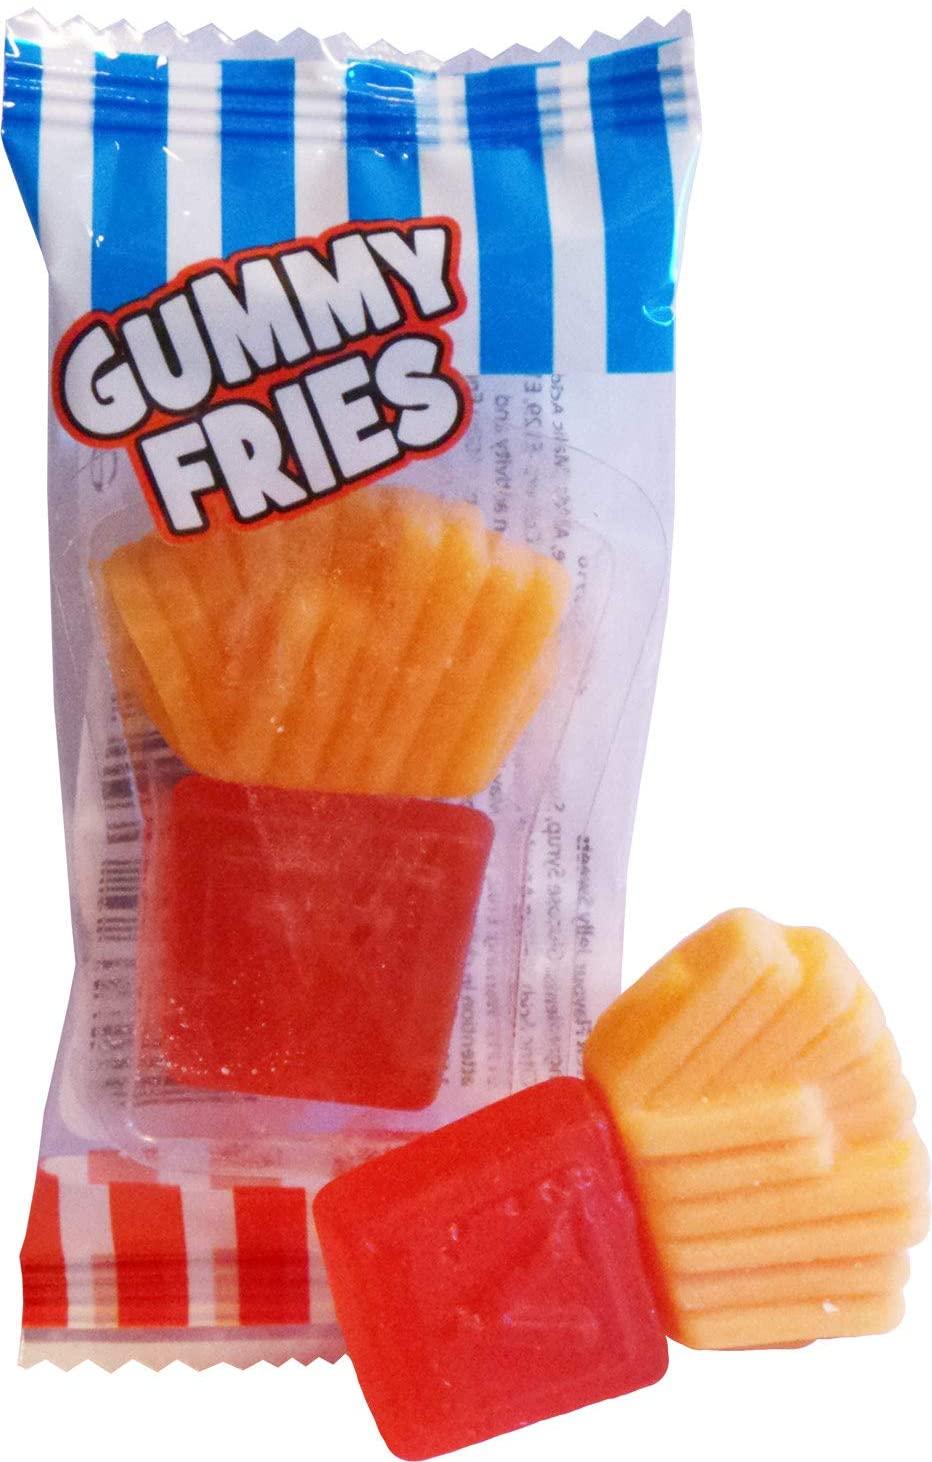 Gummy Fries